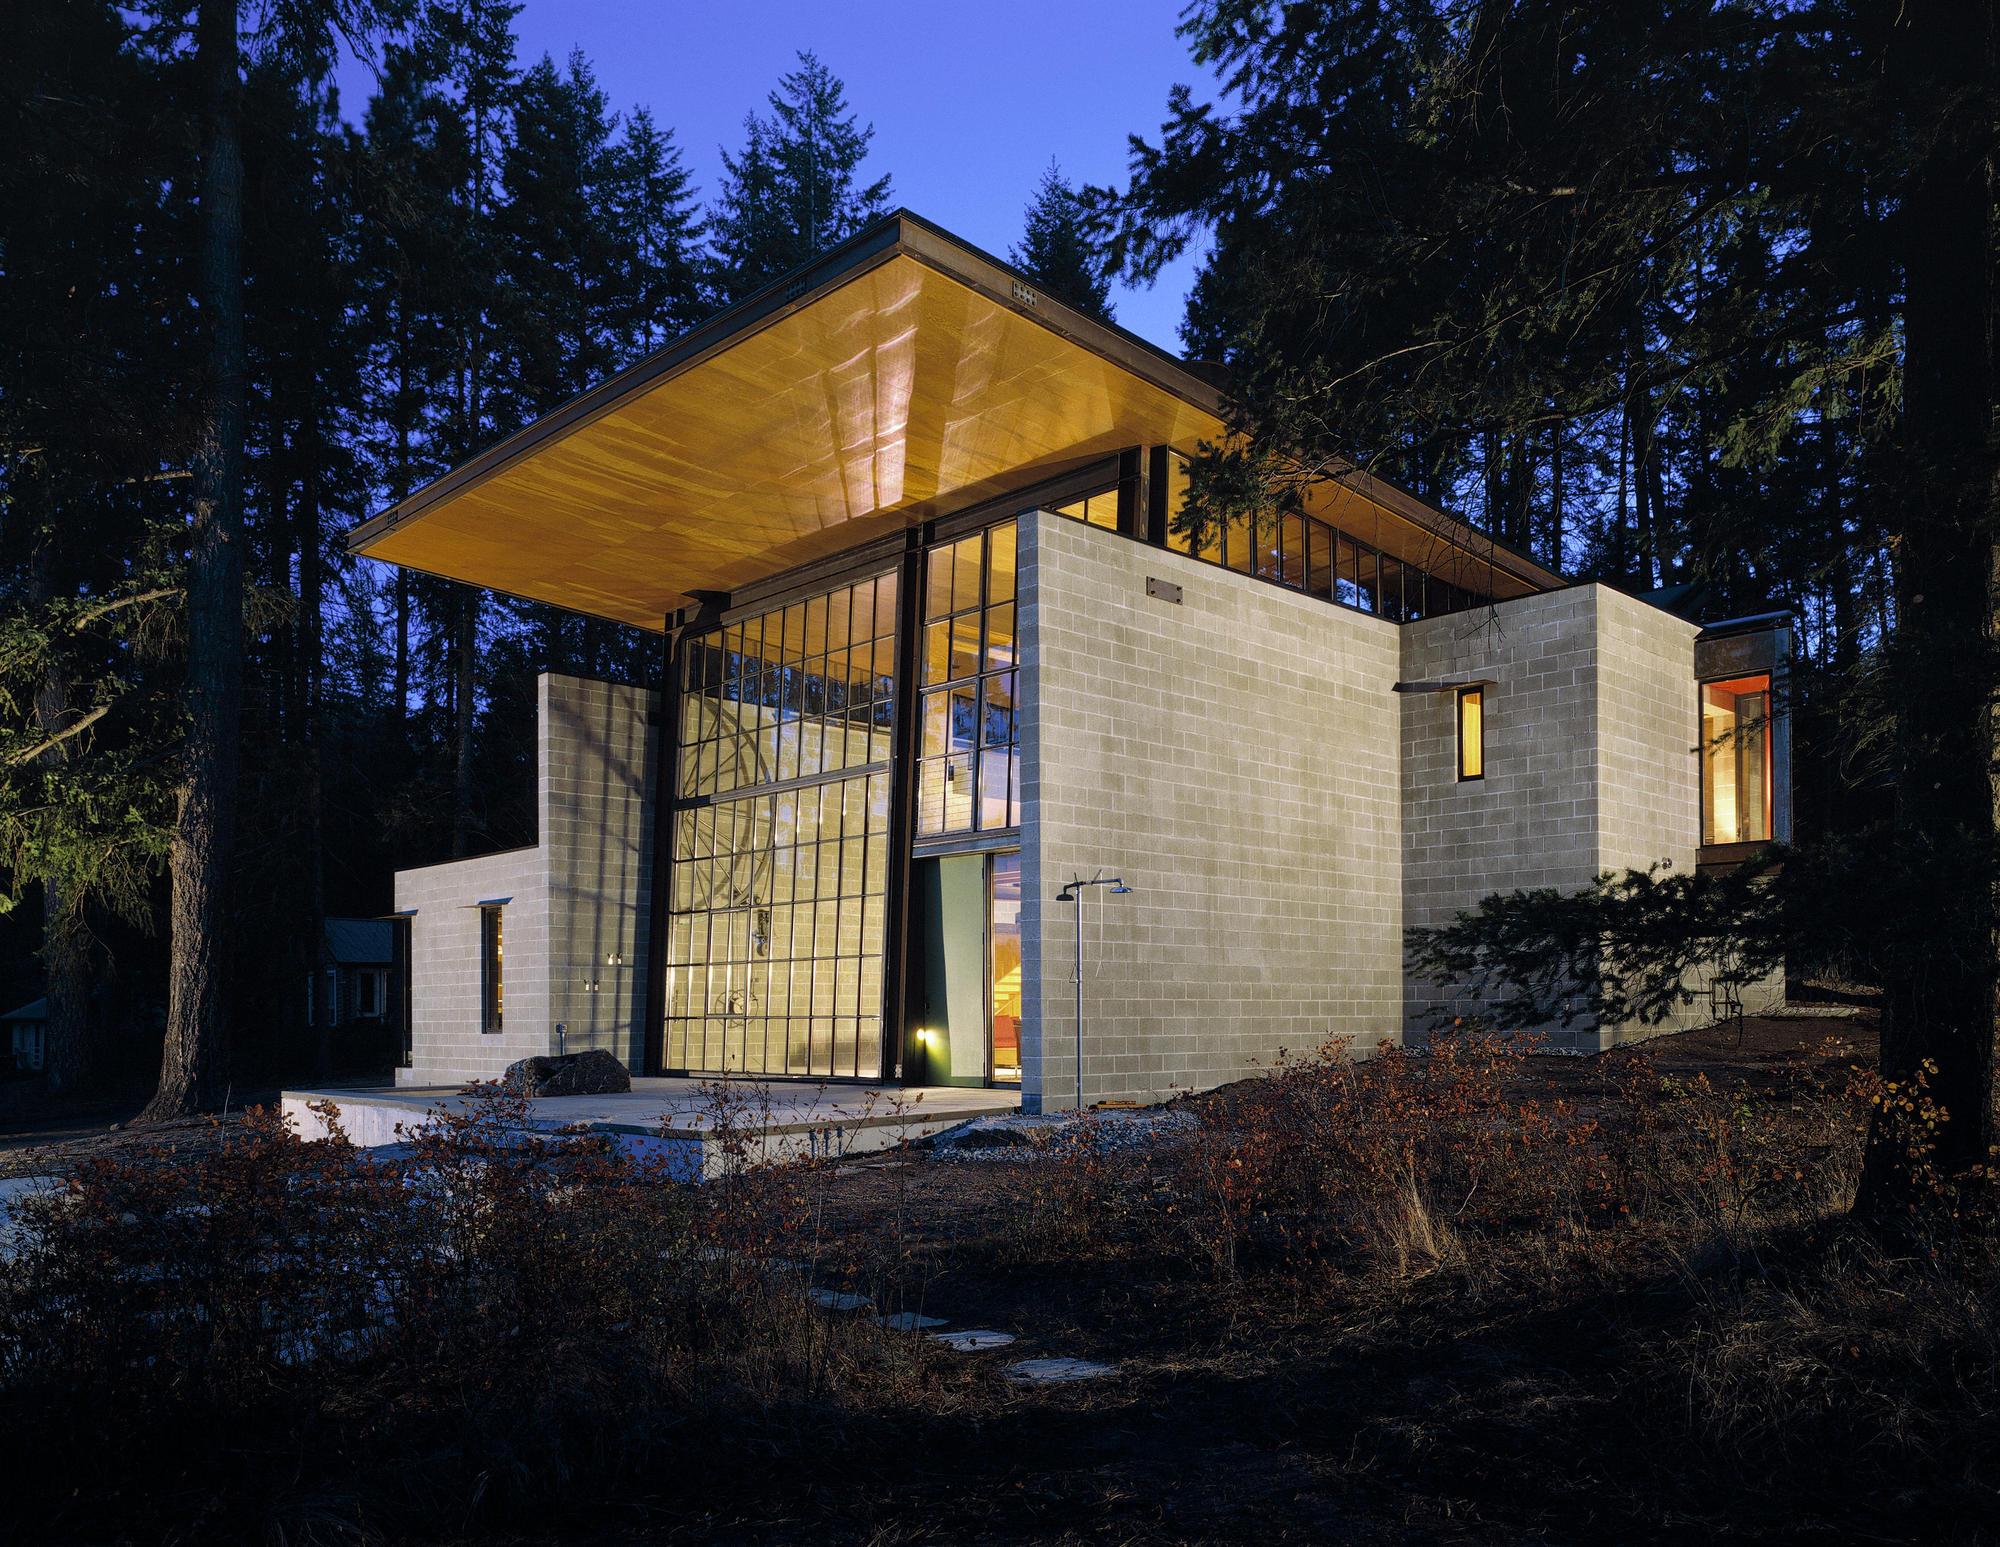 Gallery of Chicken Point Cabin / Olson Kundig - 2